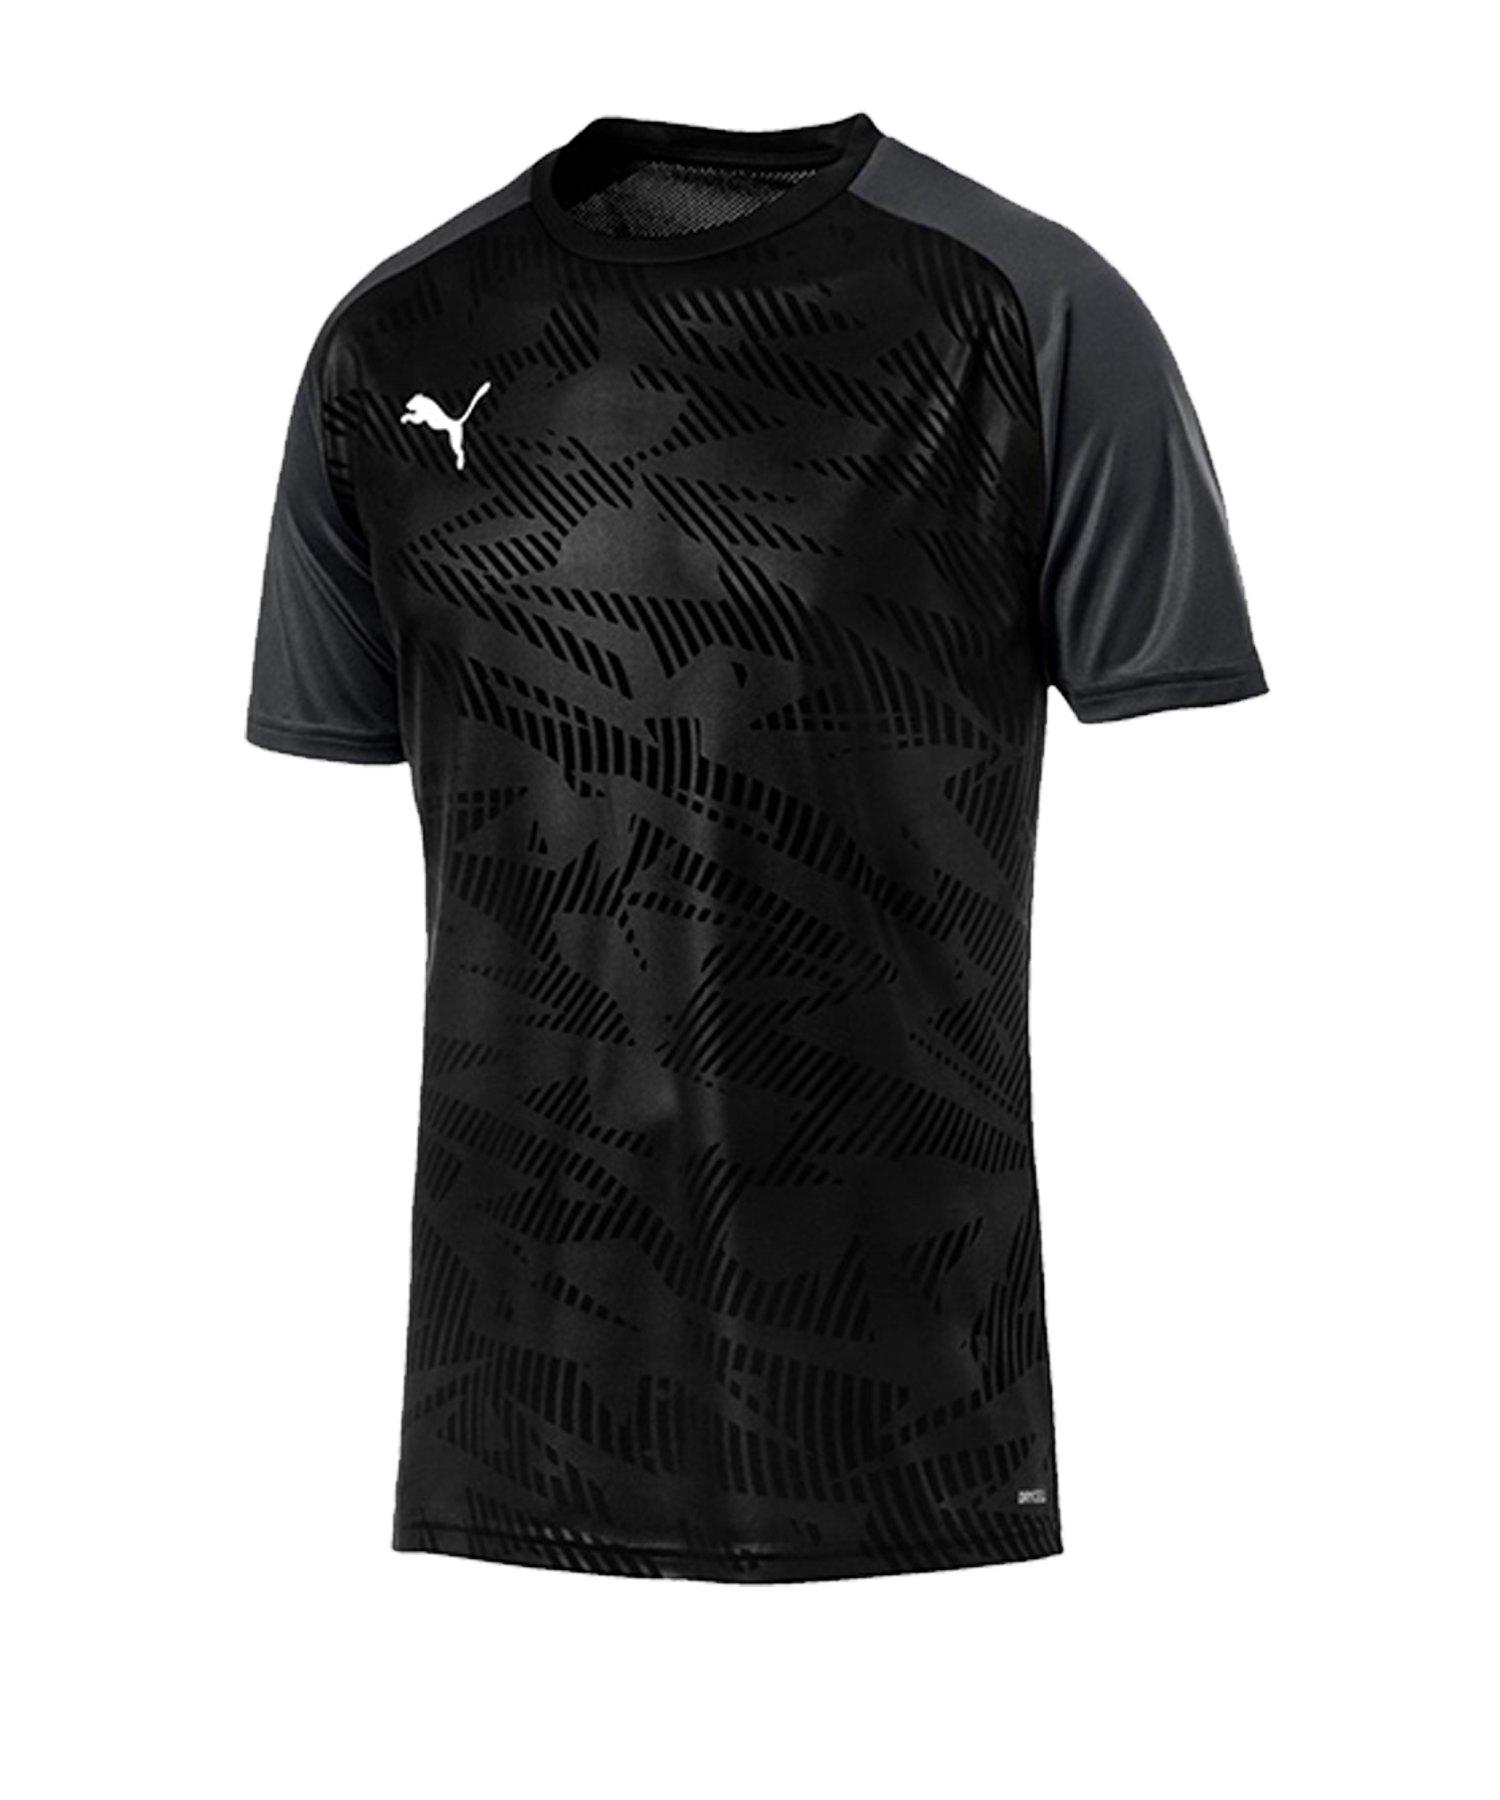 PUMA CUP Training Core T-Shirt Schwarz F03 - schwarz